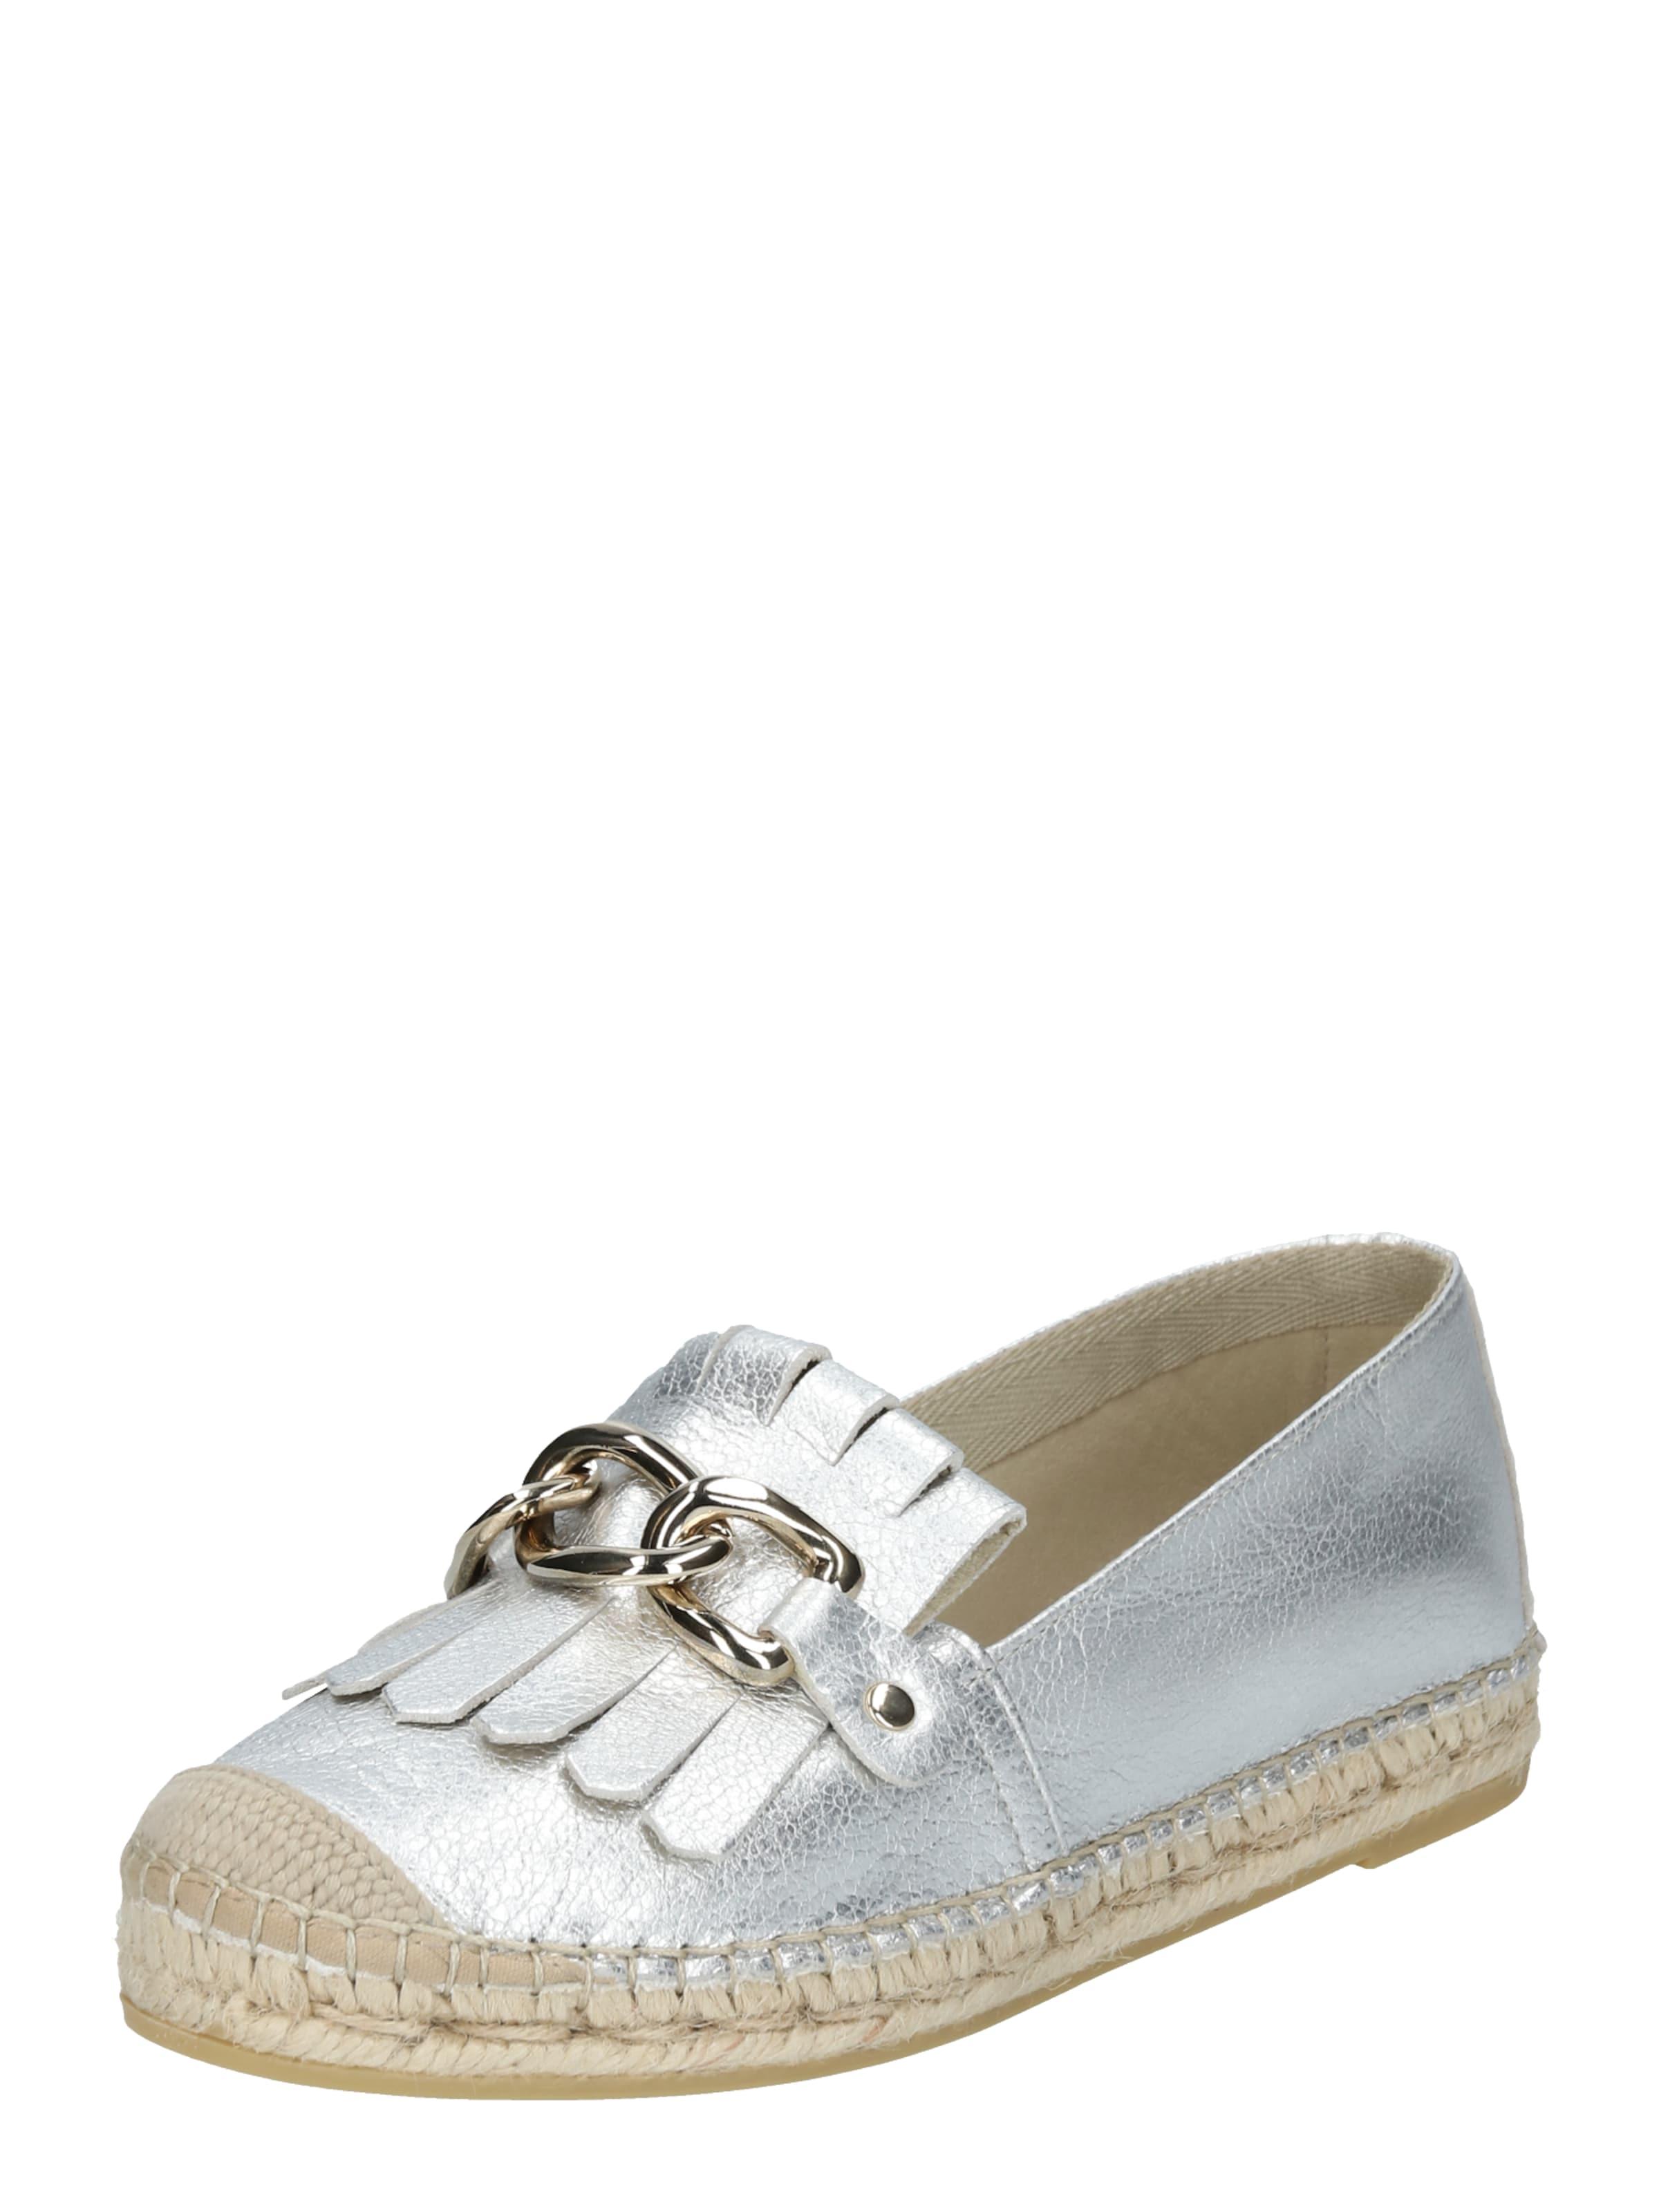 Haltbare Mode billige Schuhe Vidorreta | Espadrilles Schuhe Gut getragene Schuhe